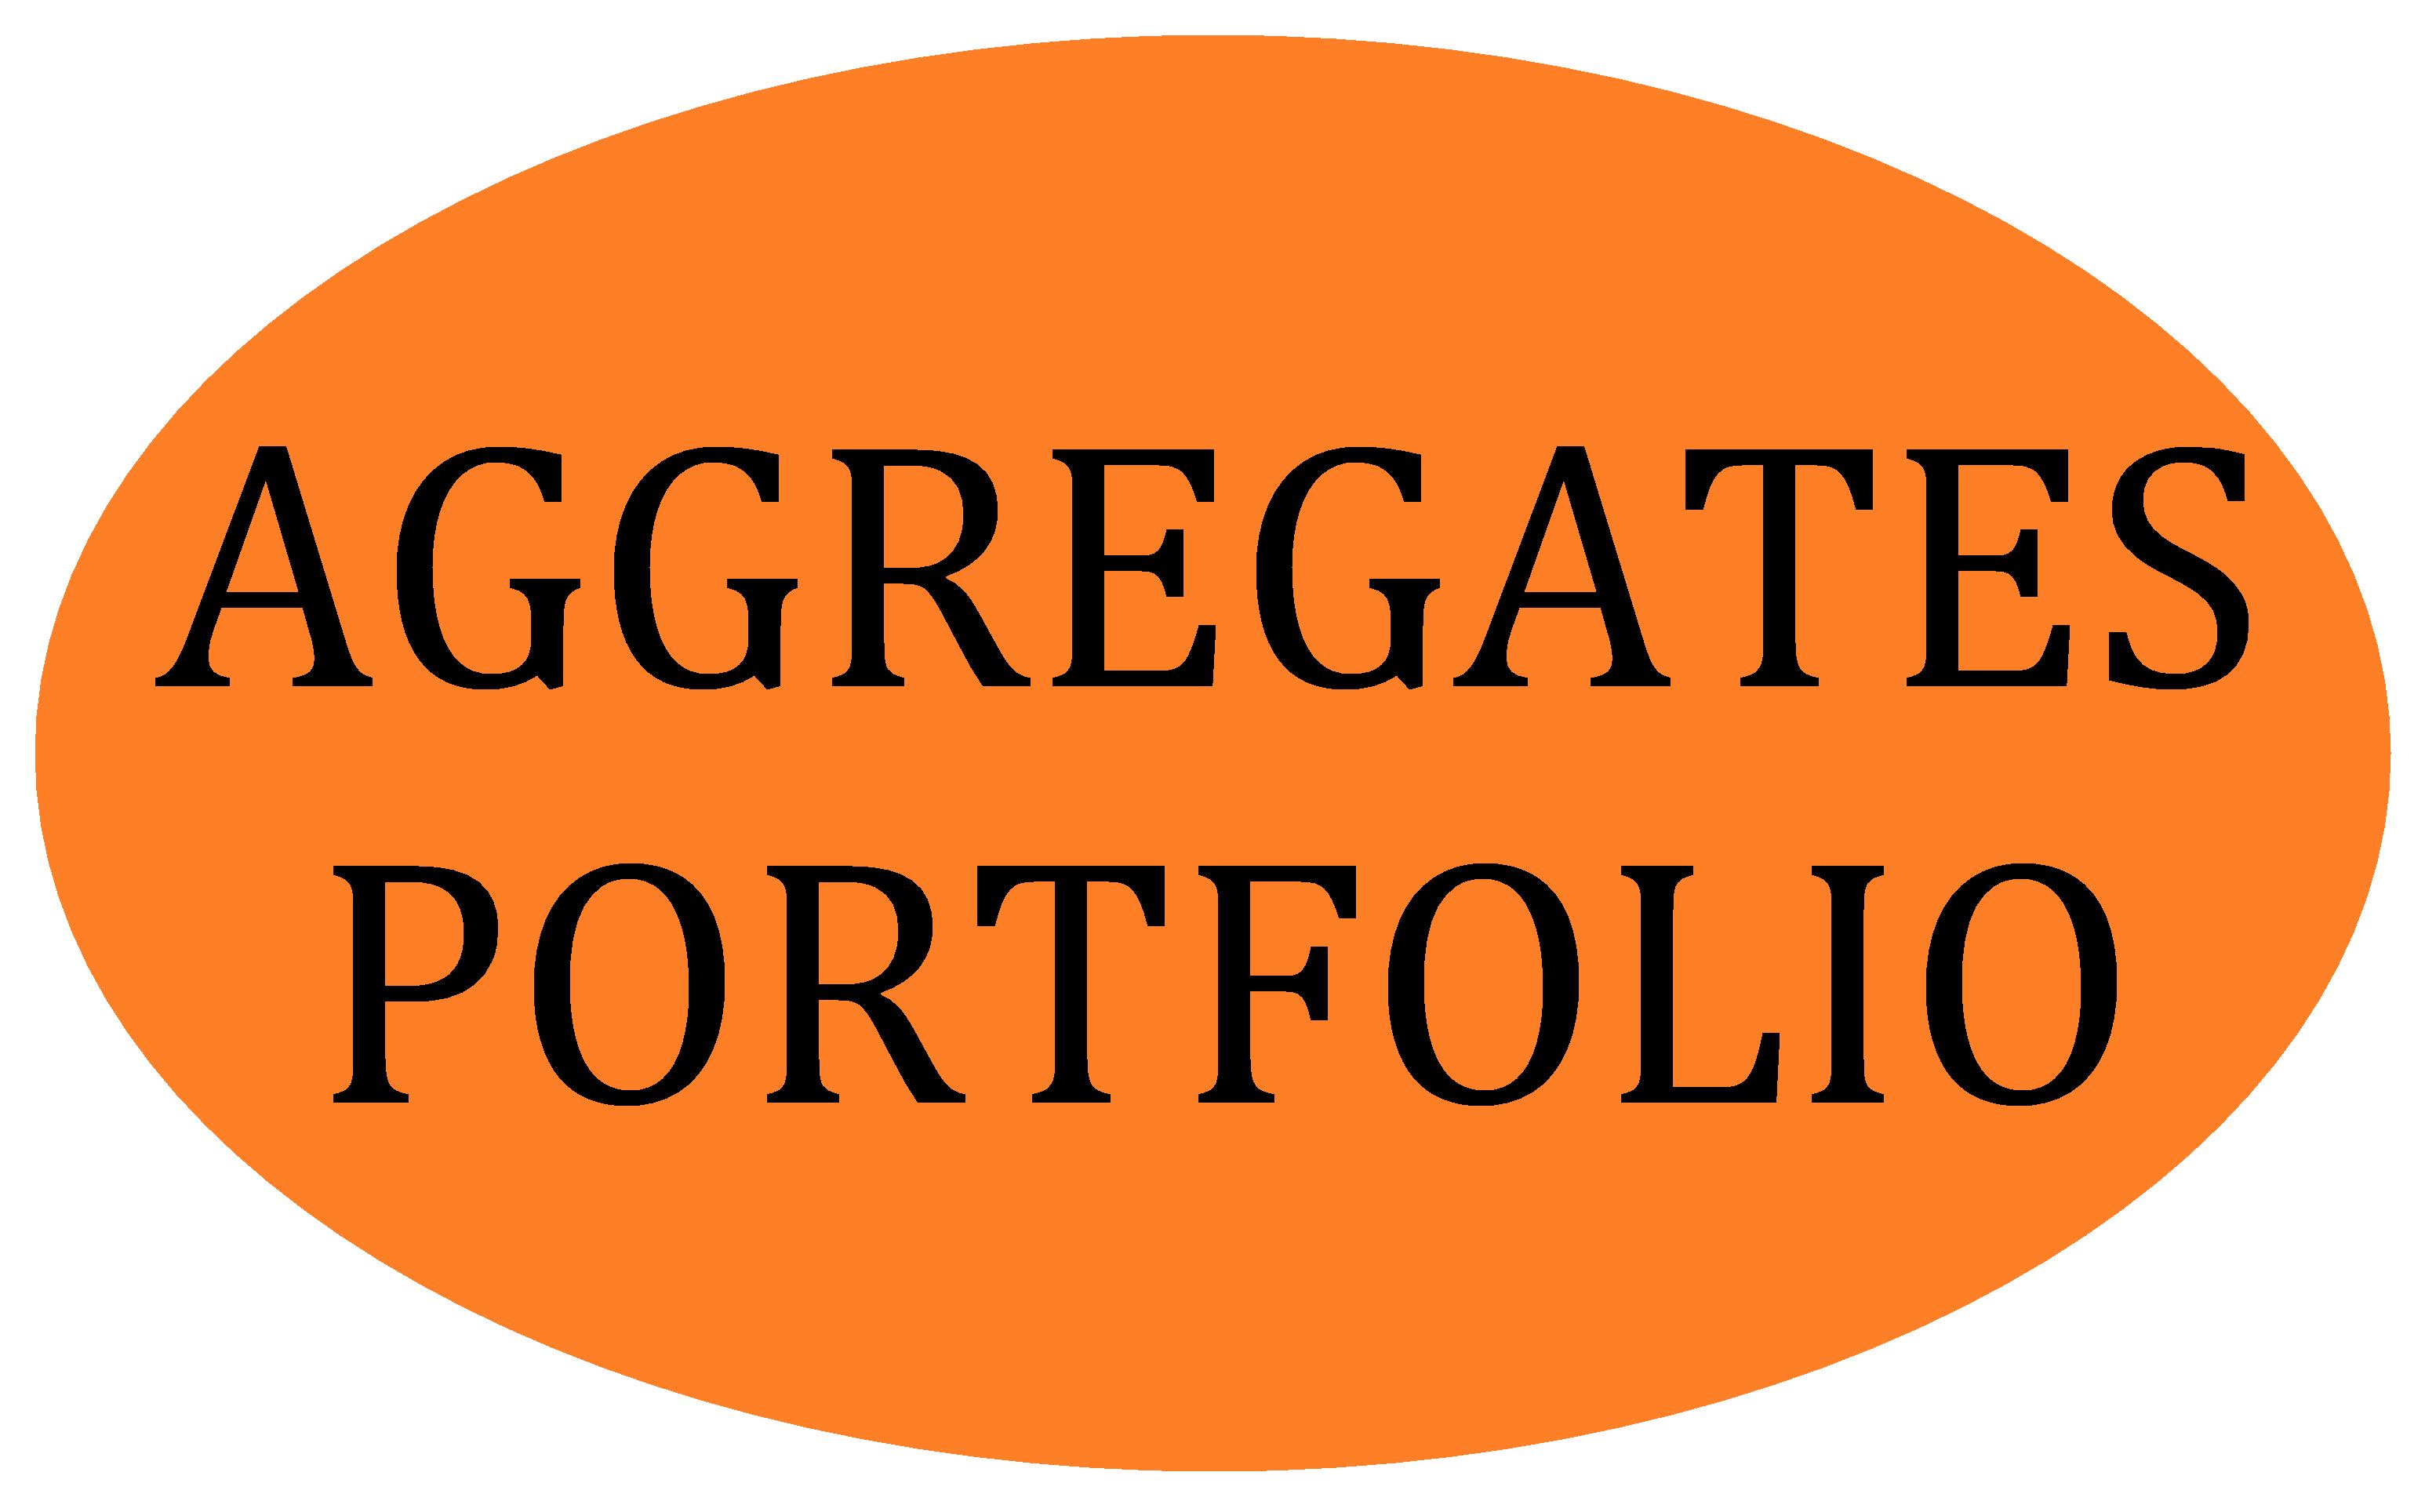 Portfolio Aggregates